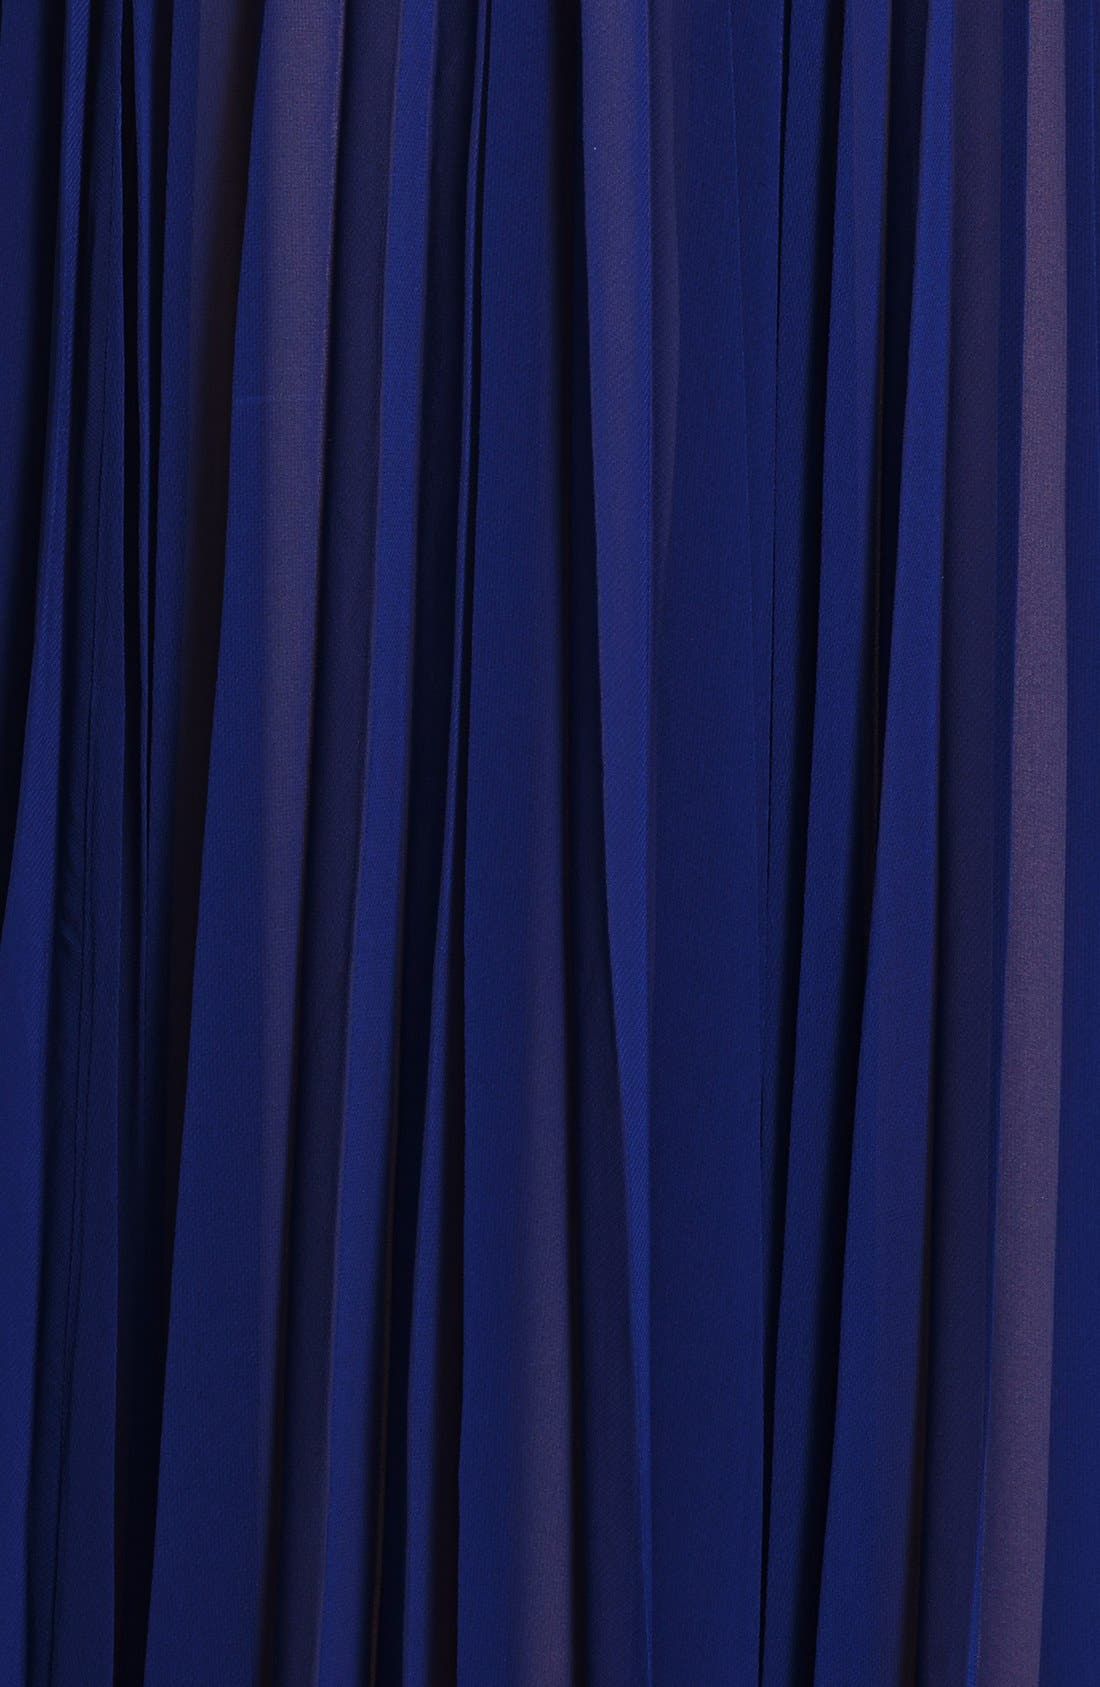 Alternate Image 3  - BCBGMAXAZRIA 'Brieena' Colorblock Sleeveless Maxi Dress